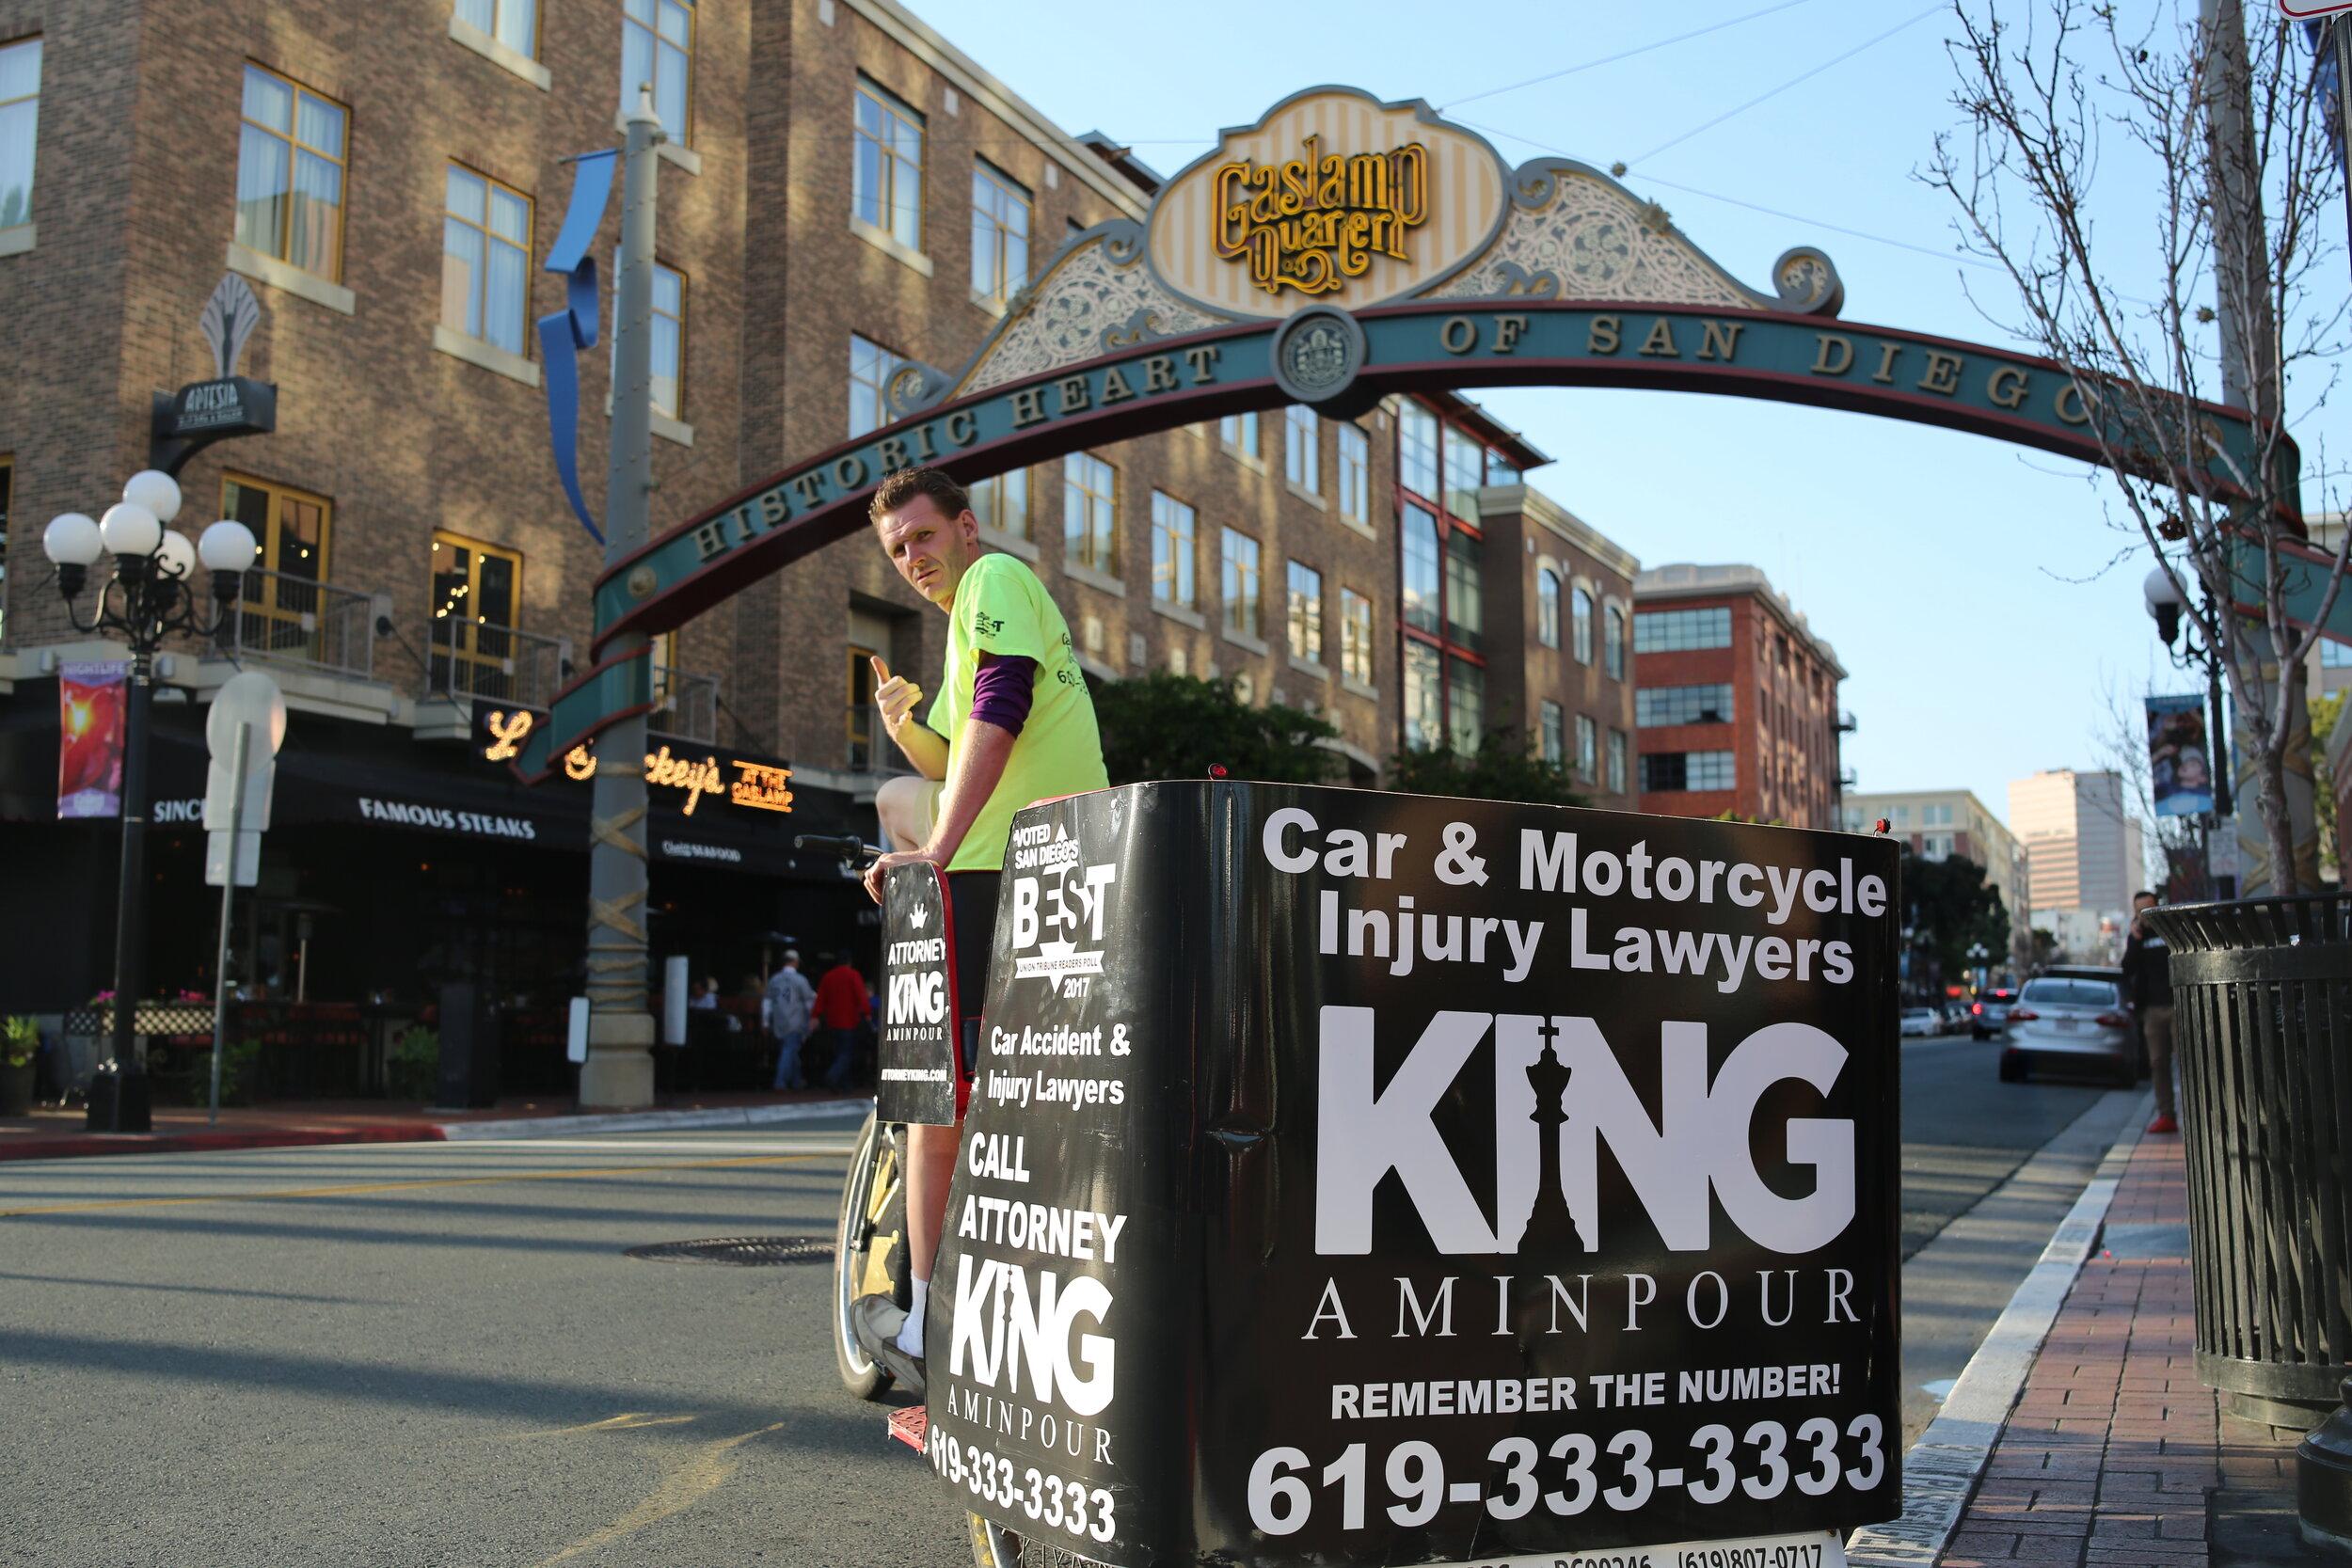 vip king pedicab